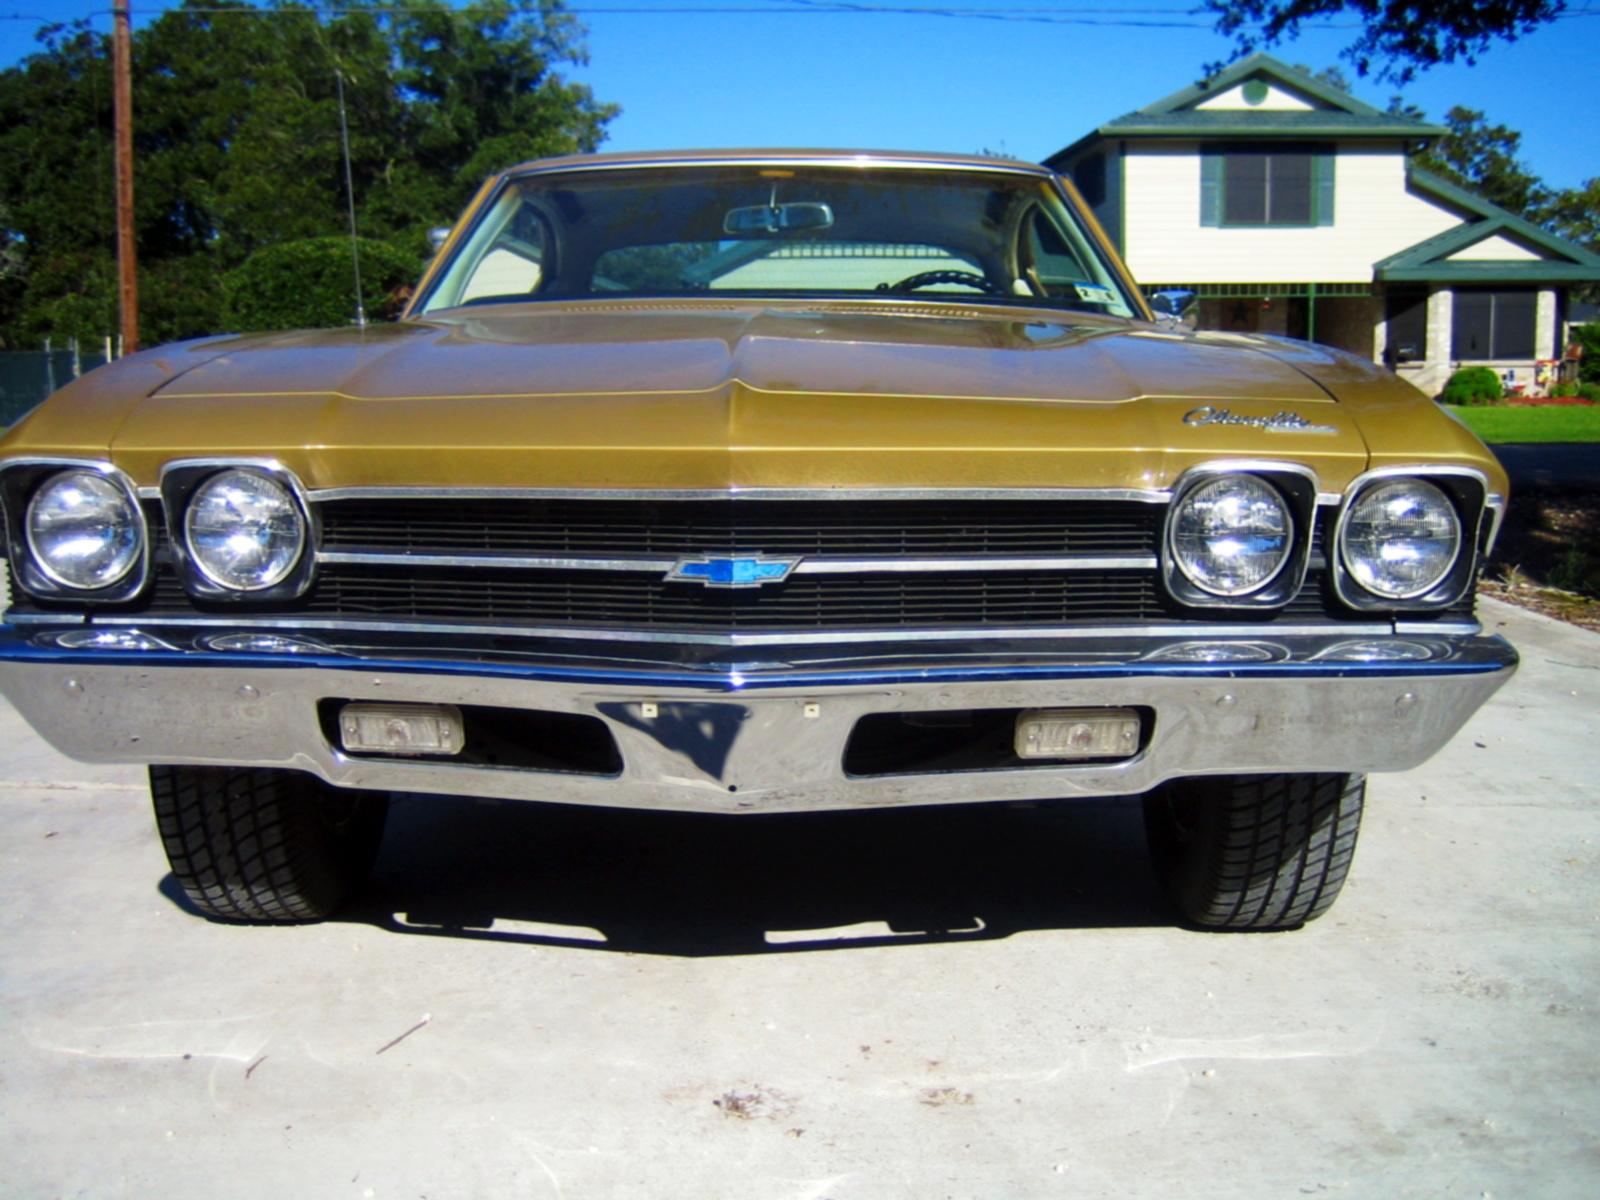 1969 Chevrolet Malibu Overview Cargurus